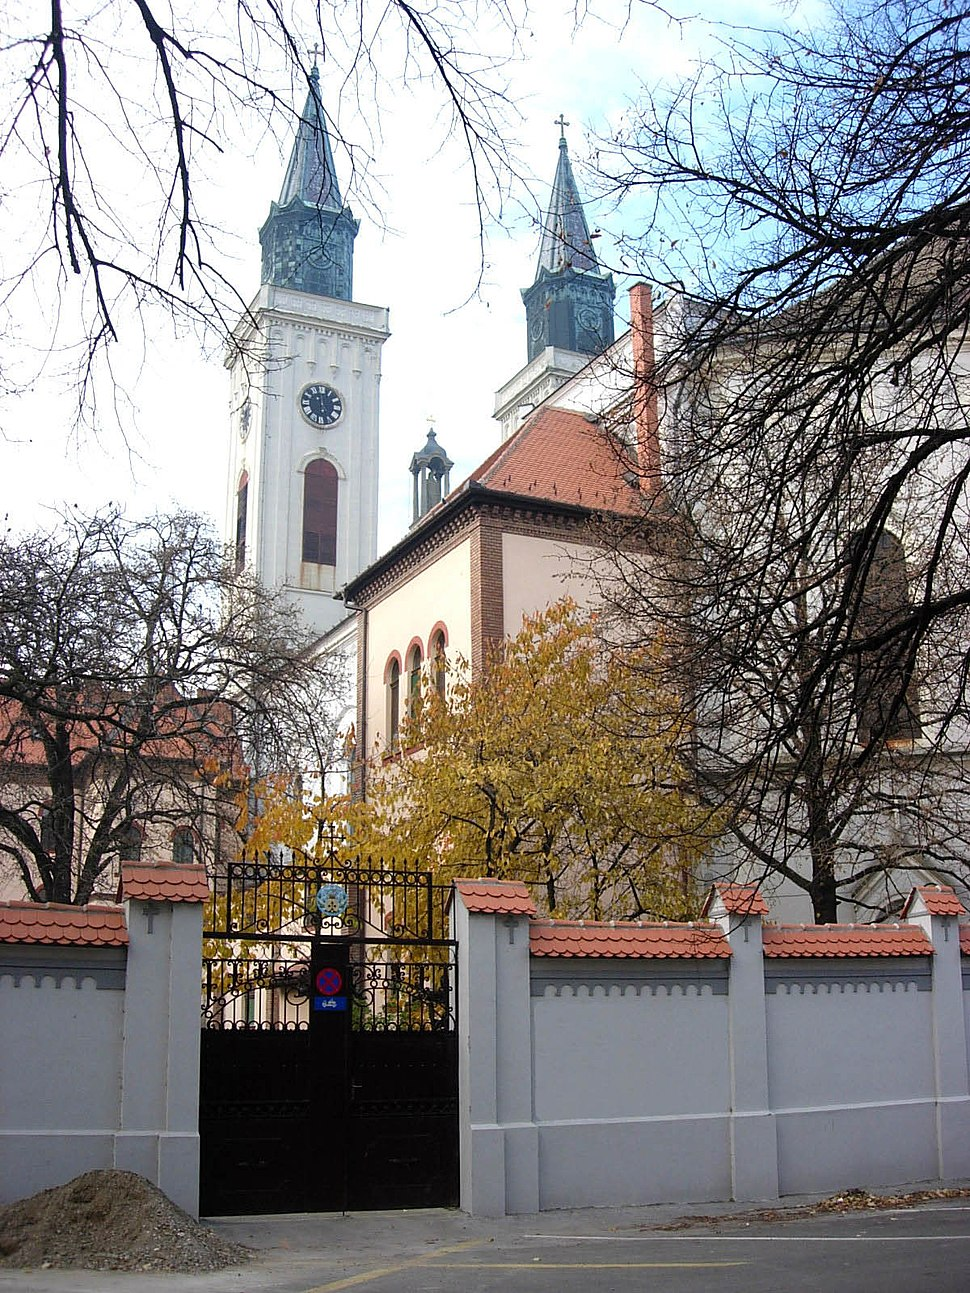 Sombor, Carmelite monastery and church